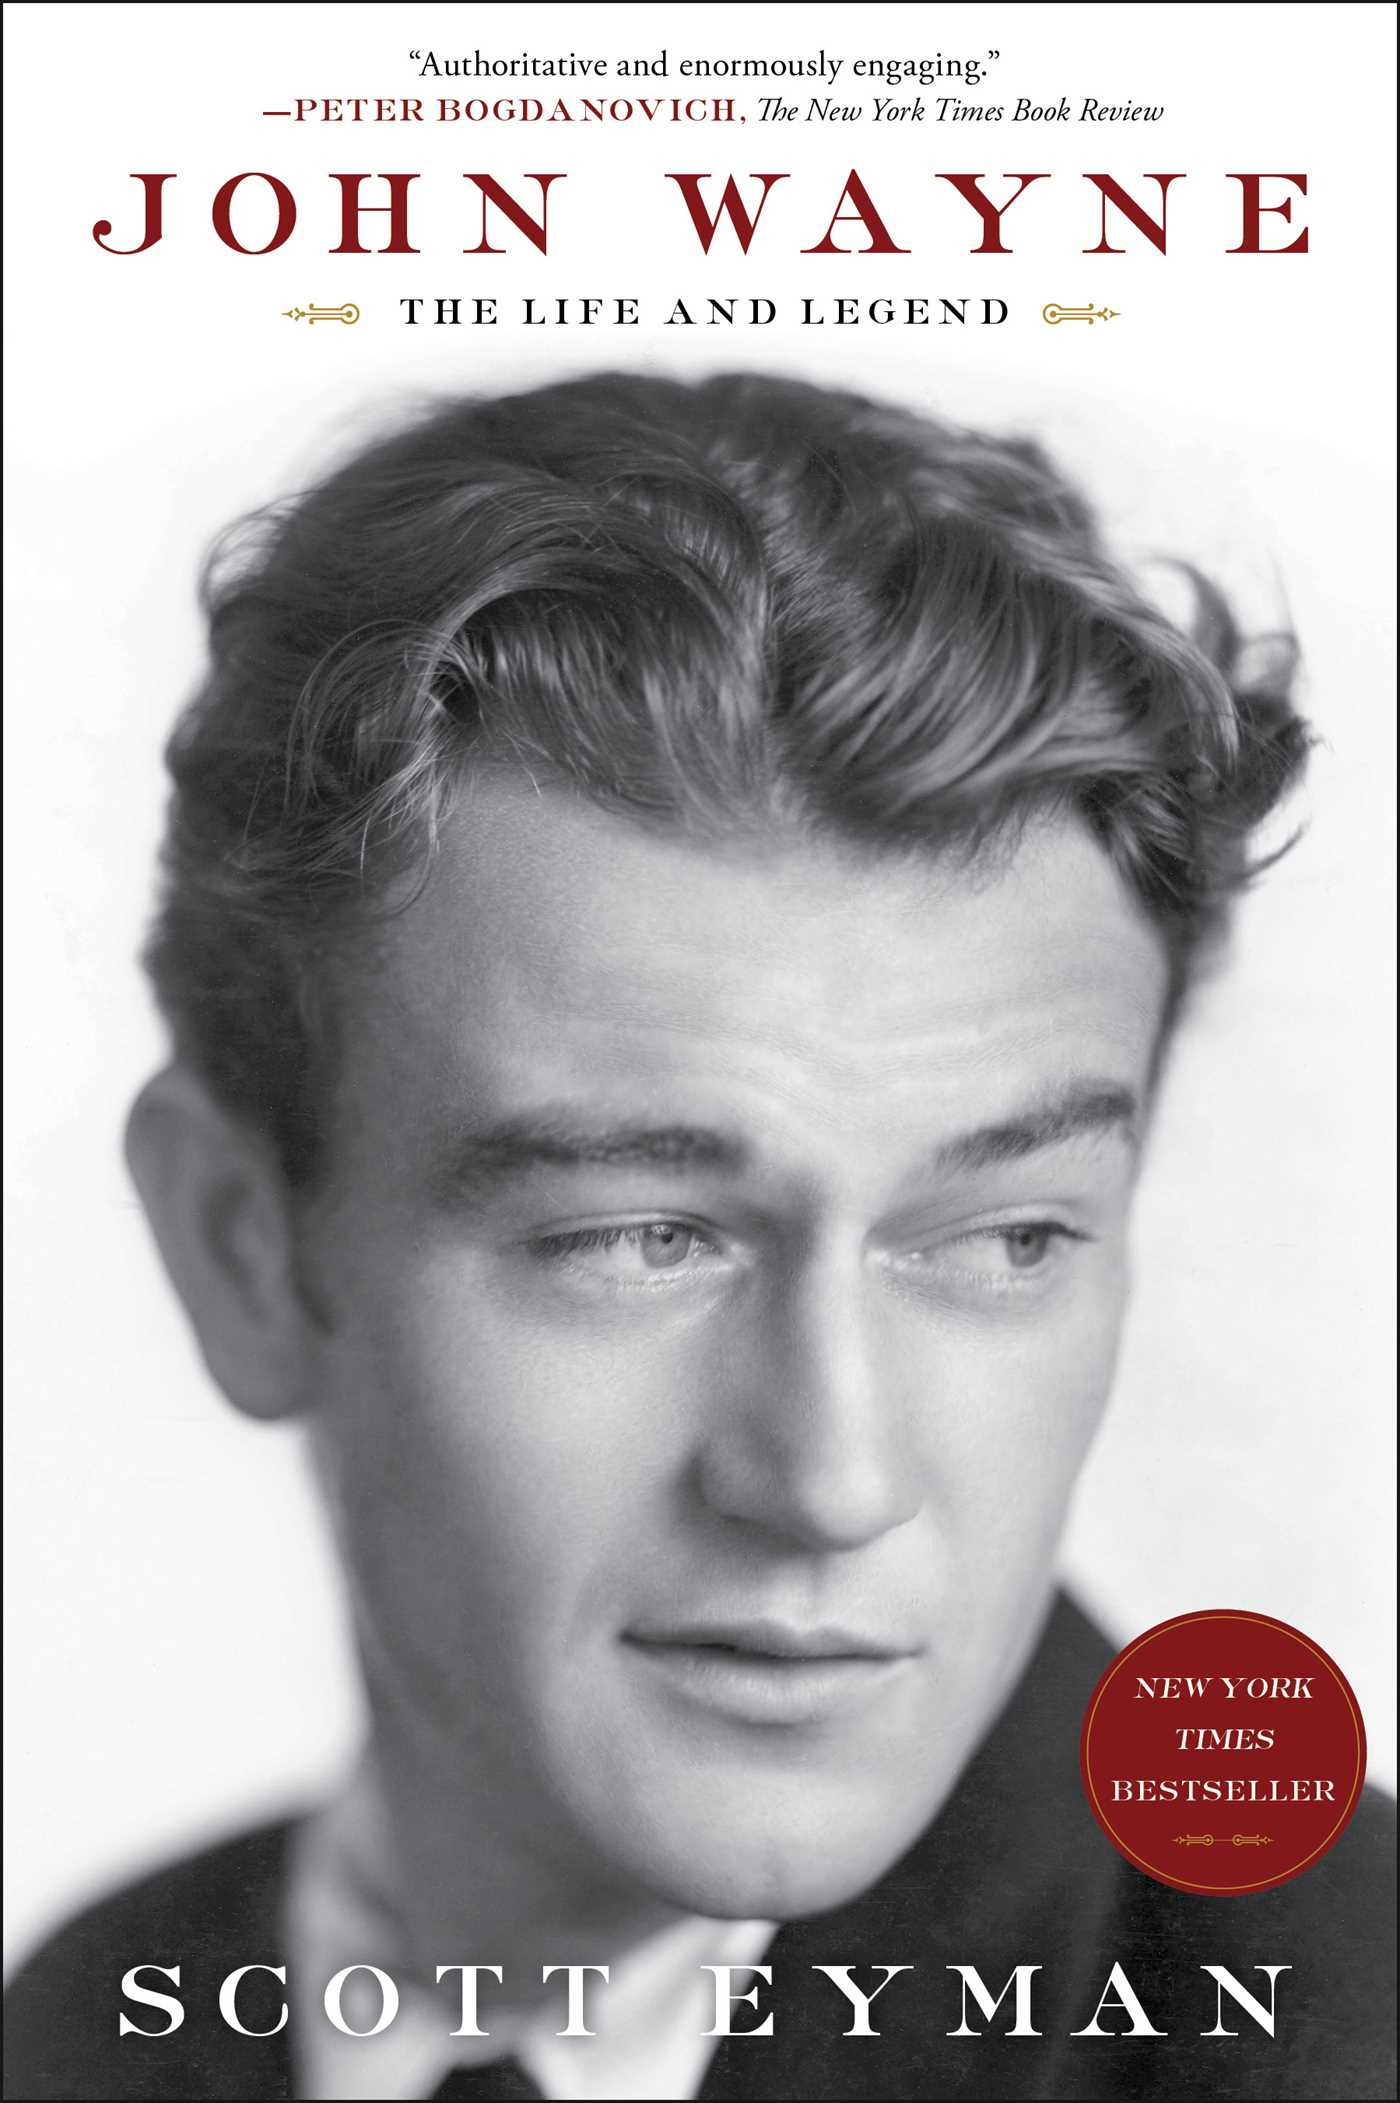 John Wayne: The Life and Legend by Scott Eyman